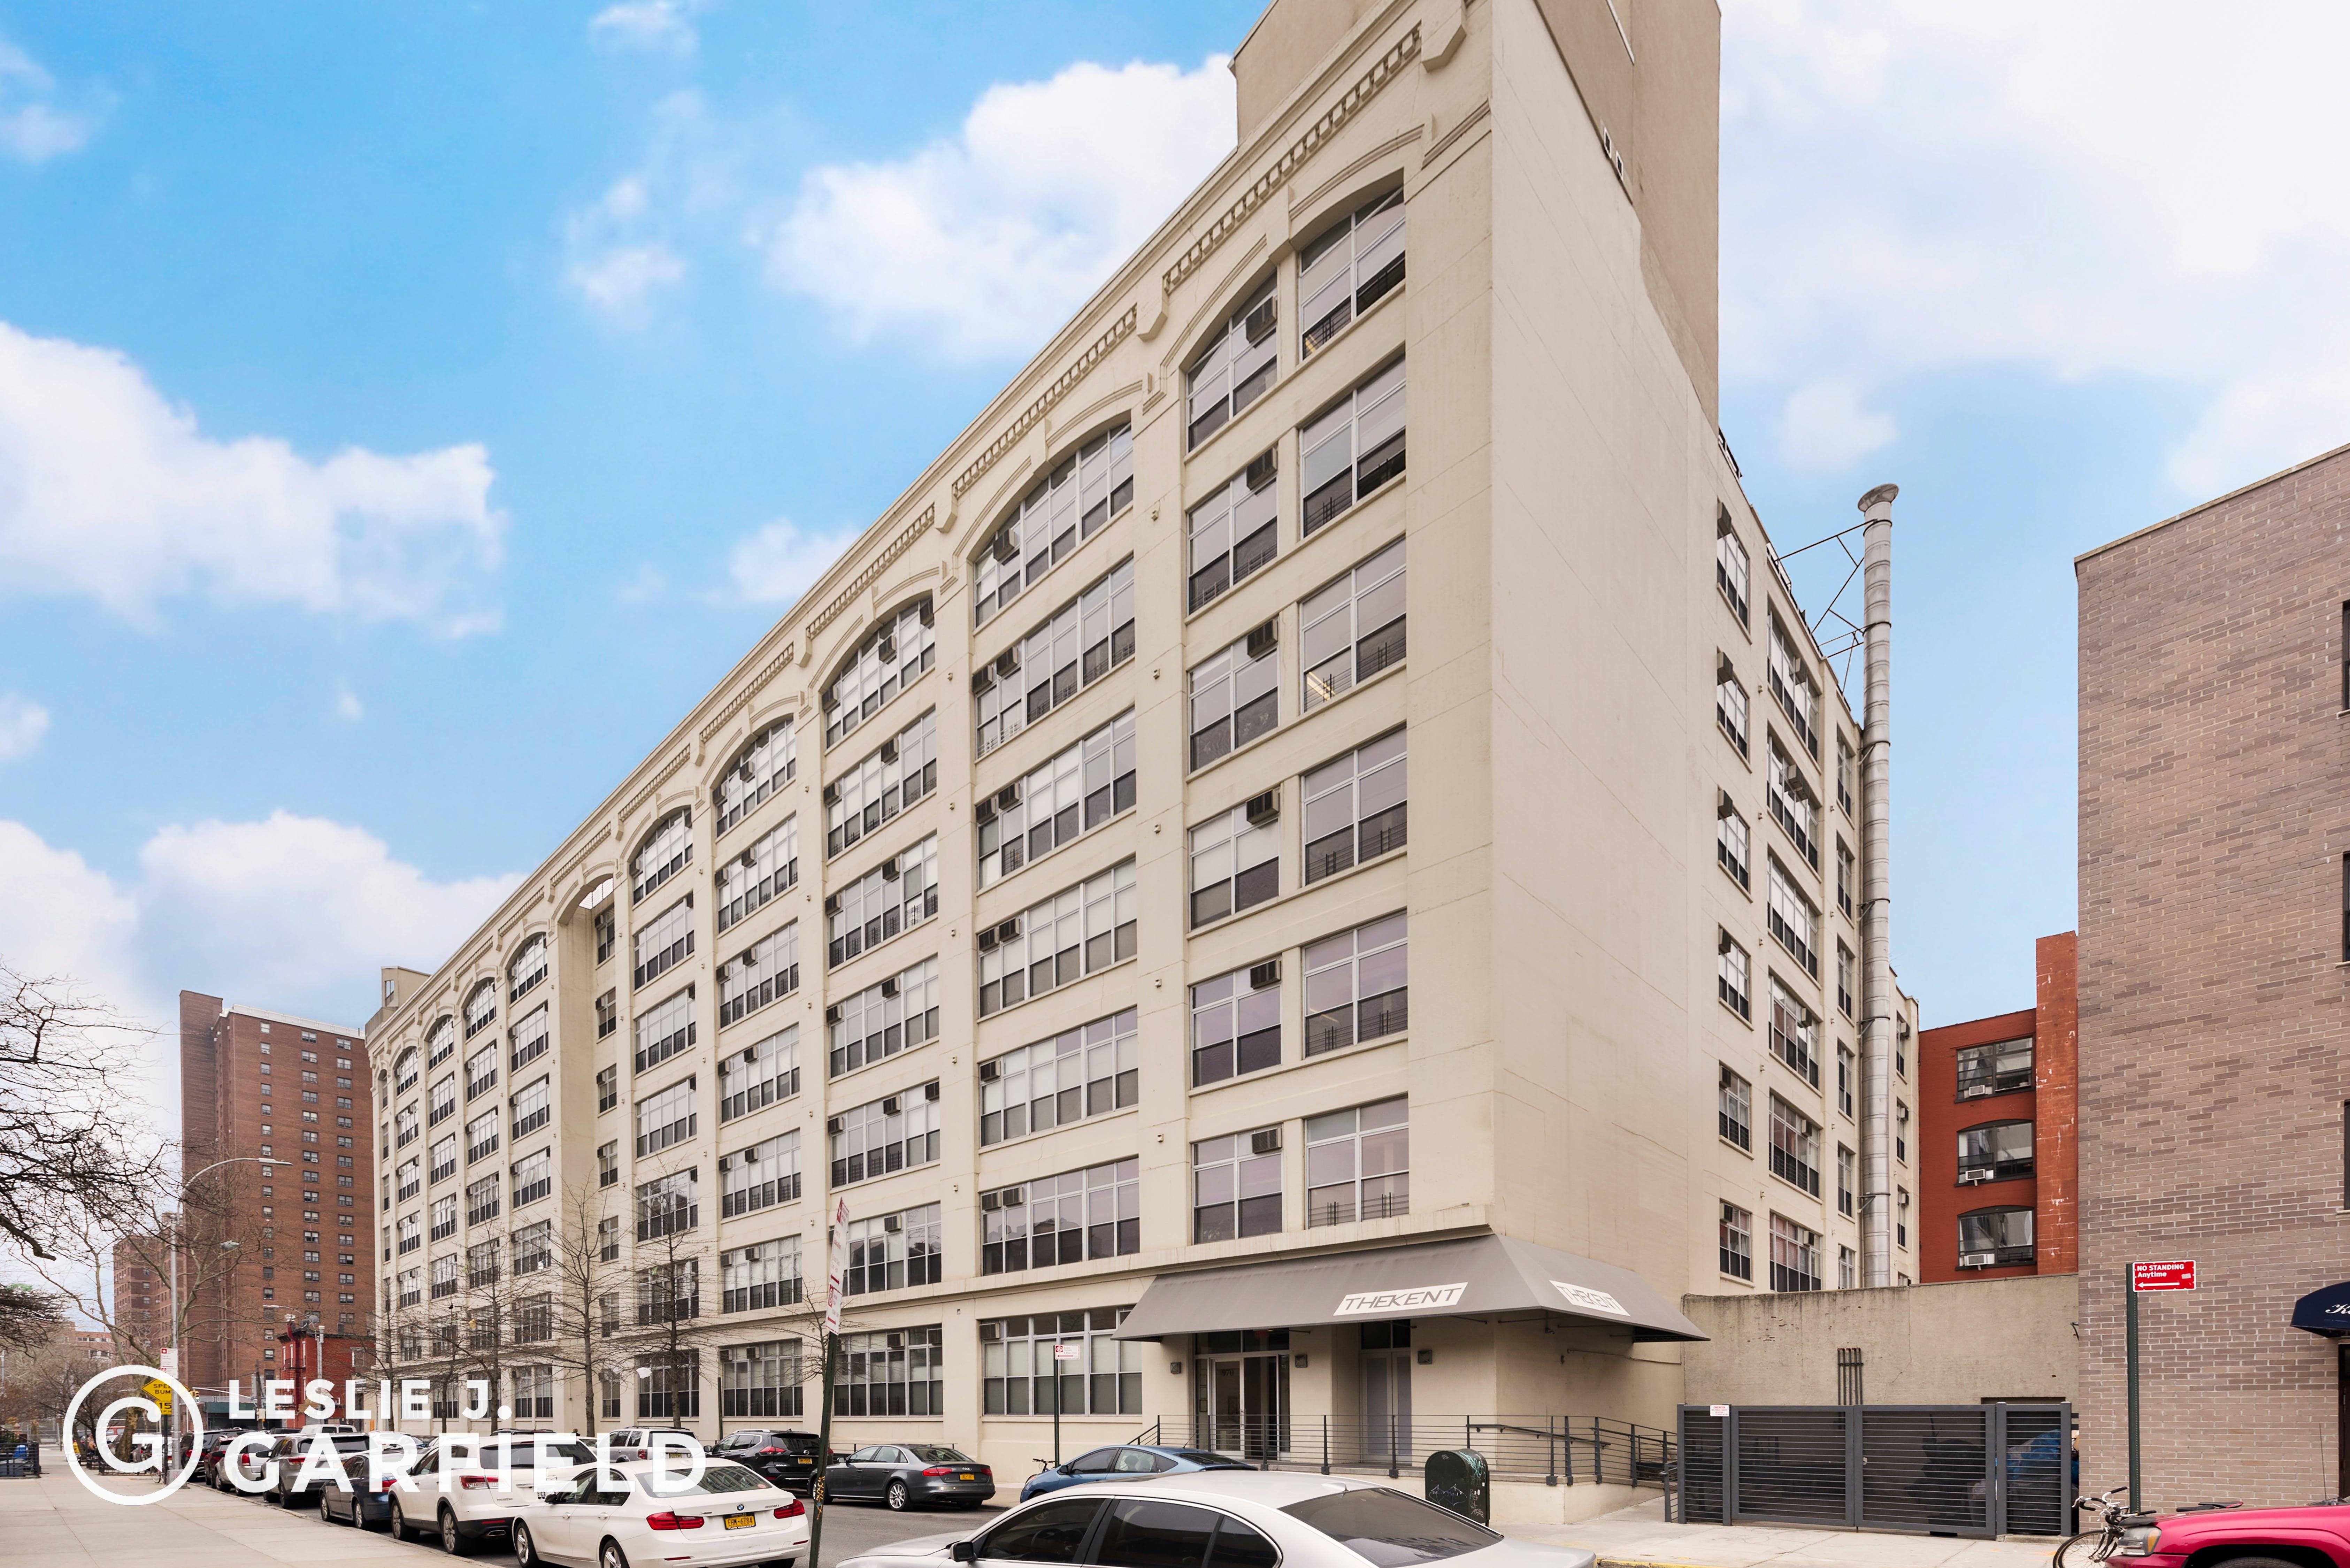 970 Kent Ave #710 - b9717650-7b0f-44d1-97c2-95e8df07873c - New York City Townhouse Real Estate